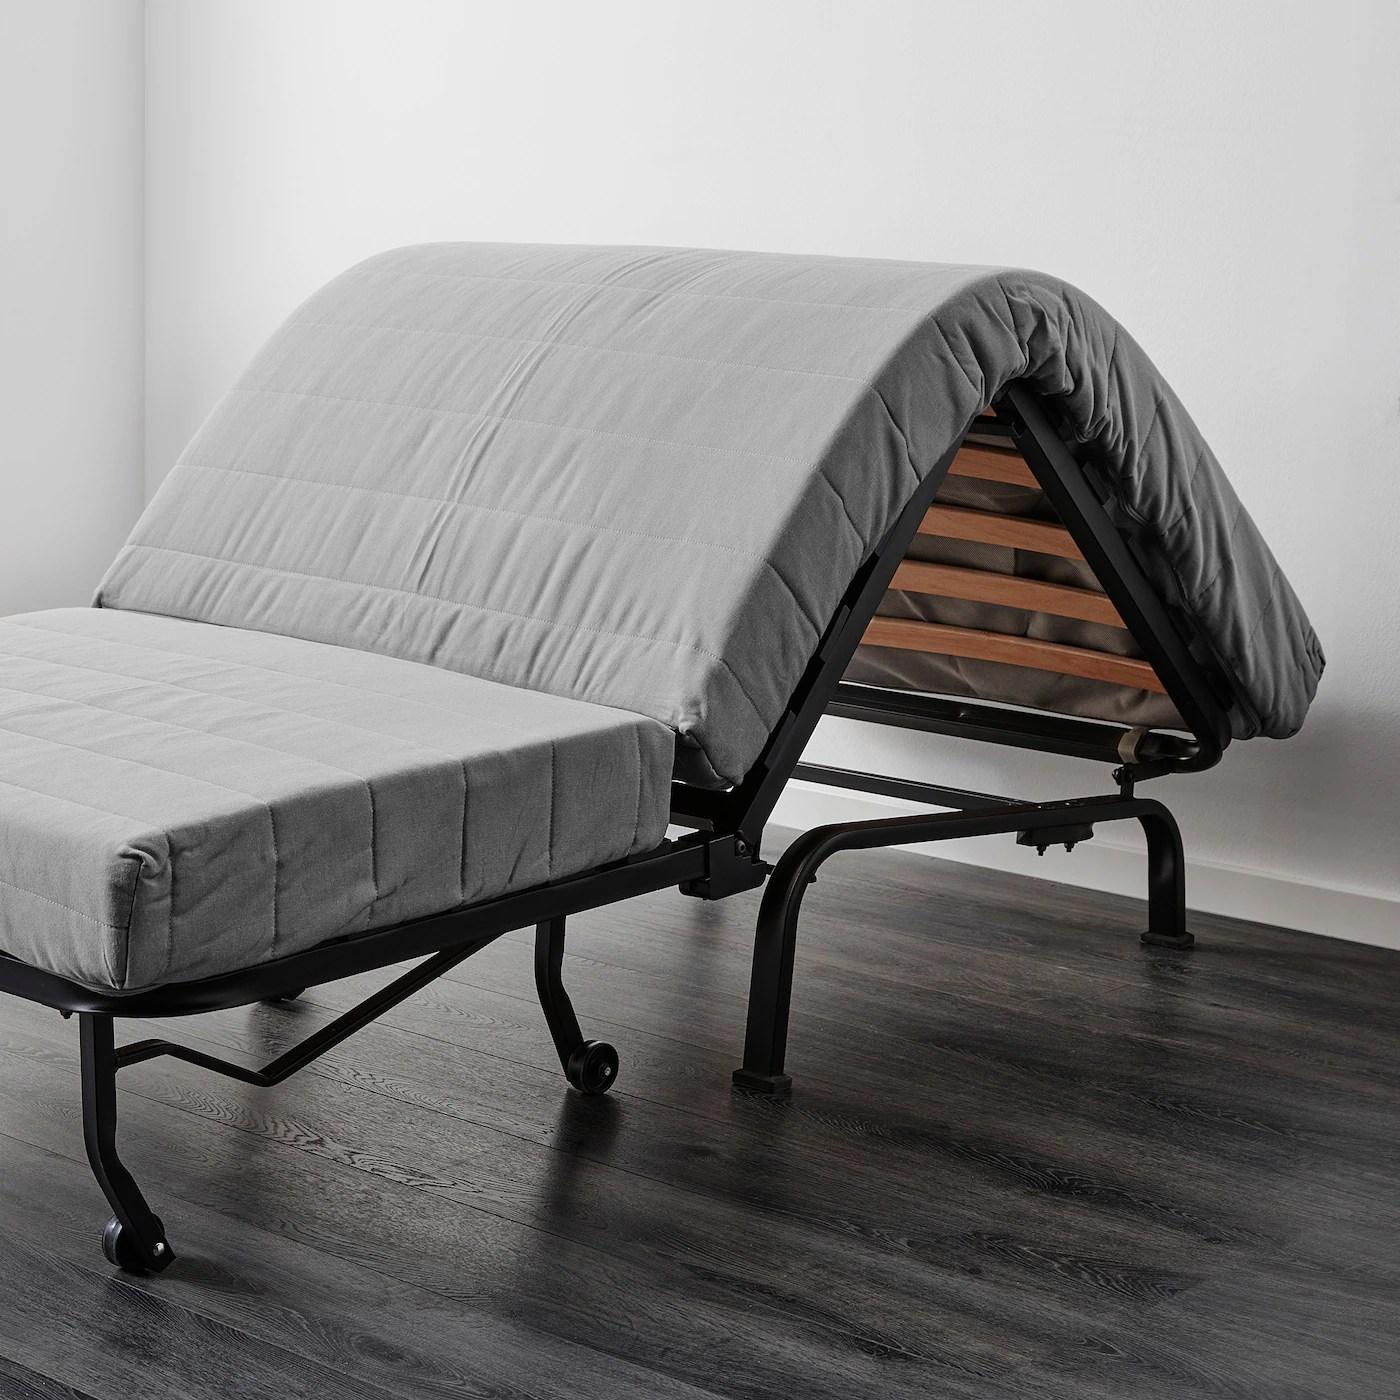 Lycksele Lovas Ransta White Chair Bed Ikea